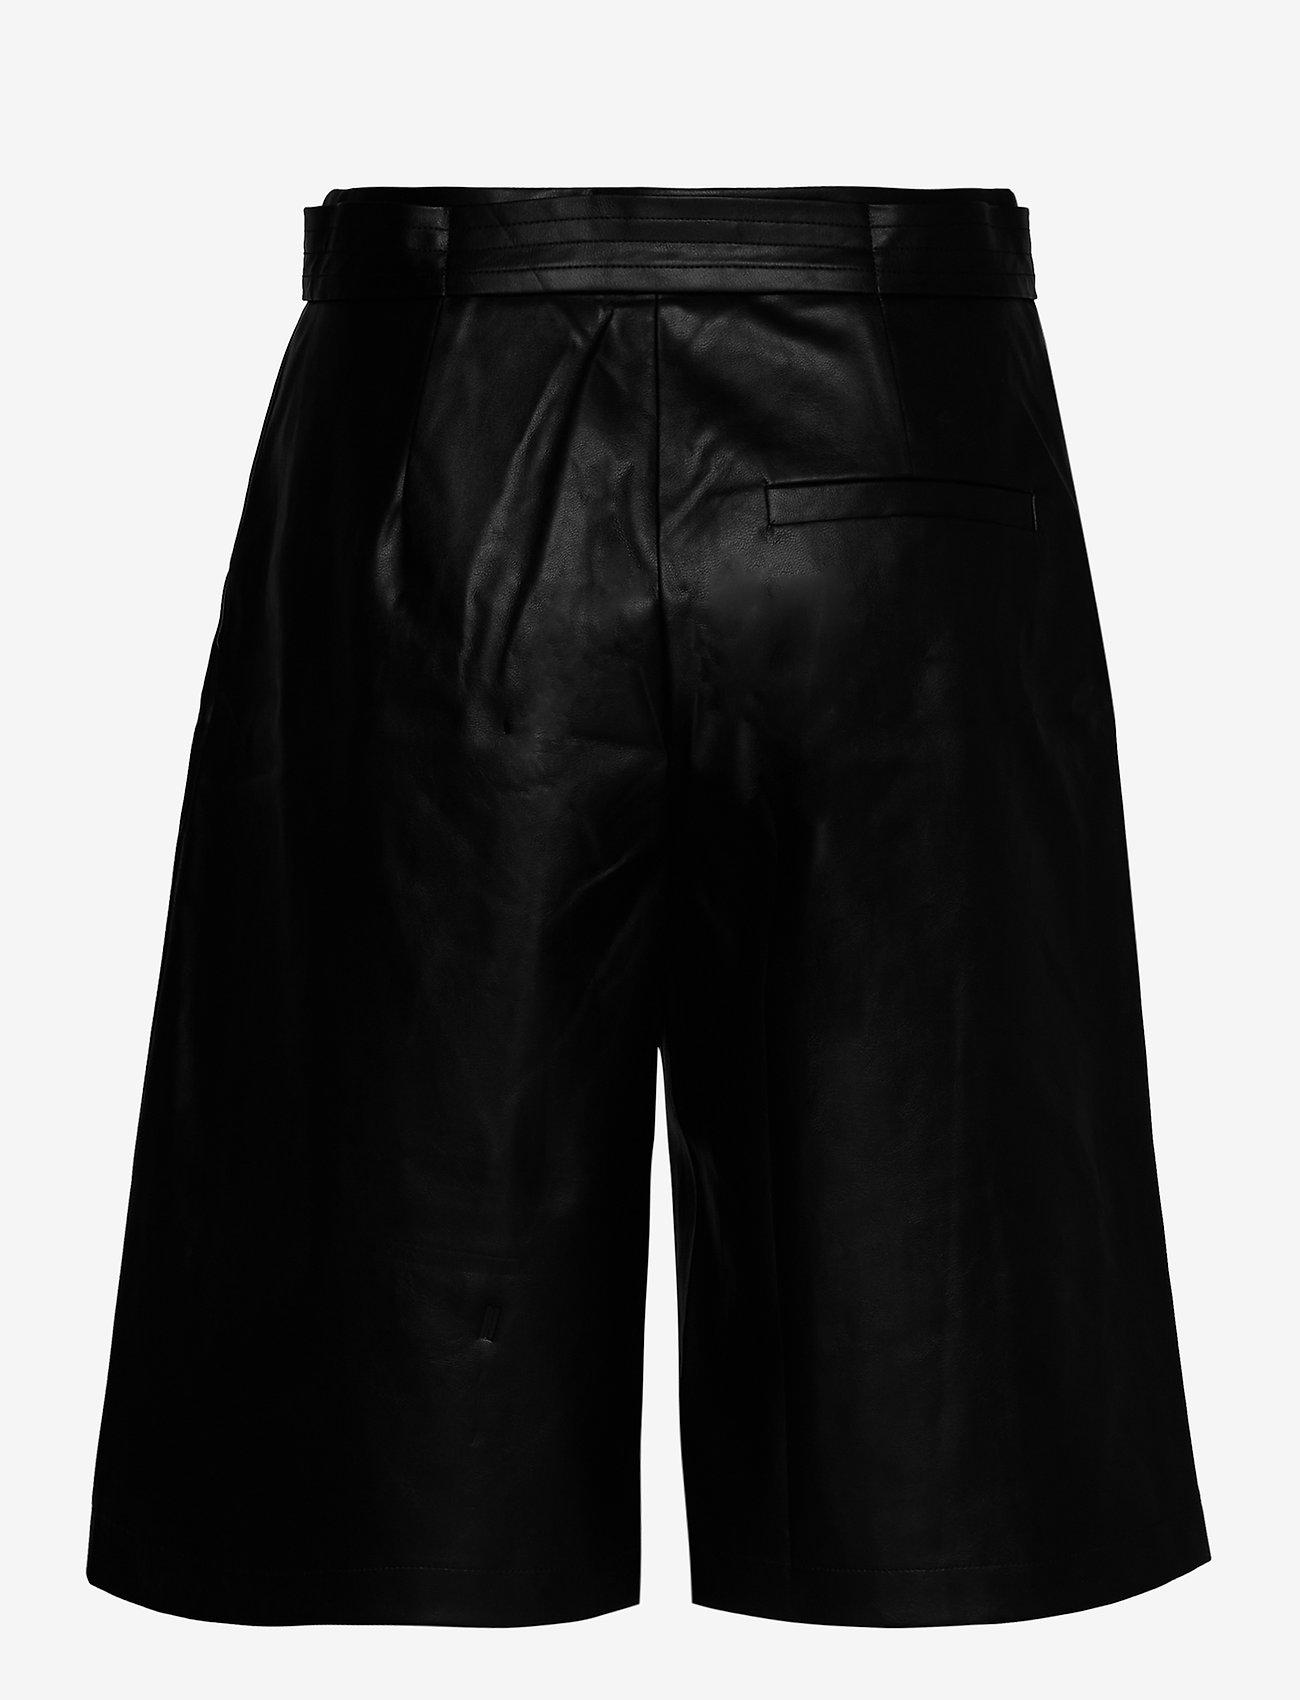 Marie Shorts (Black) (1715 kr) - DESIGNERS, REMIX